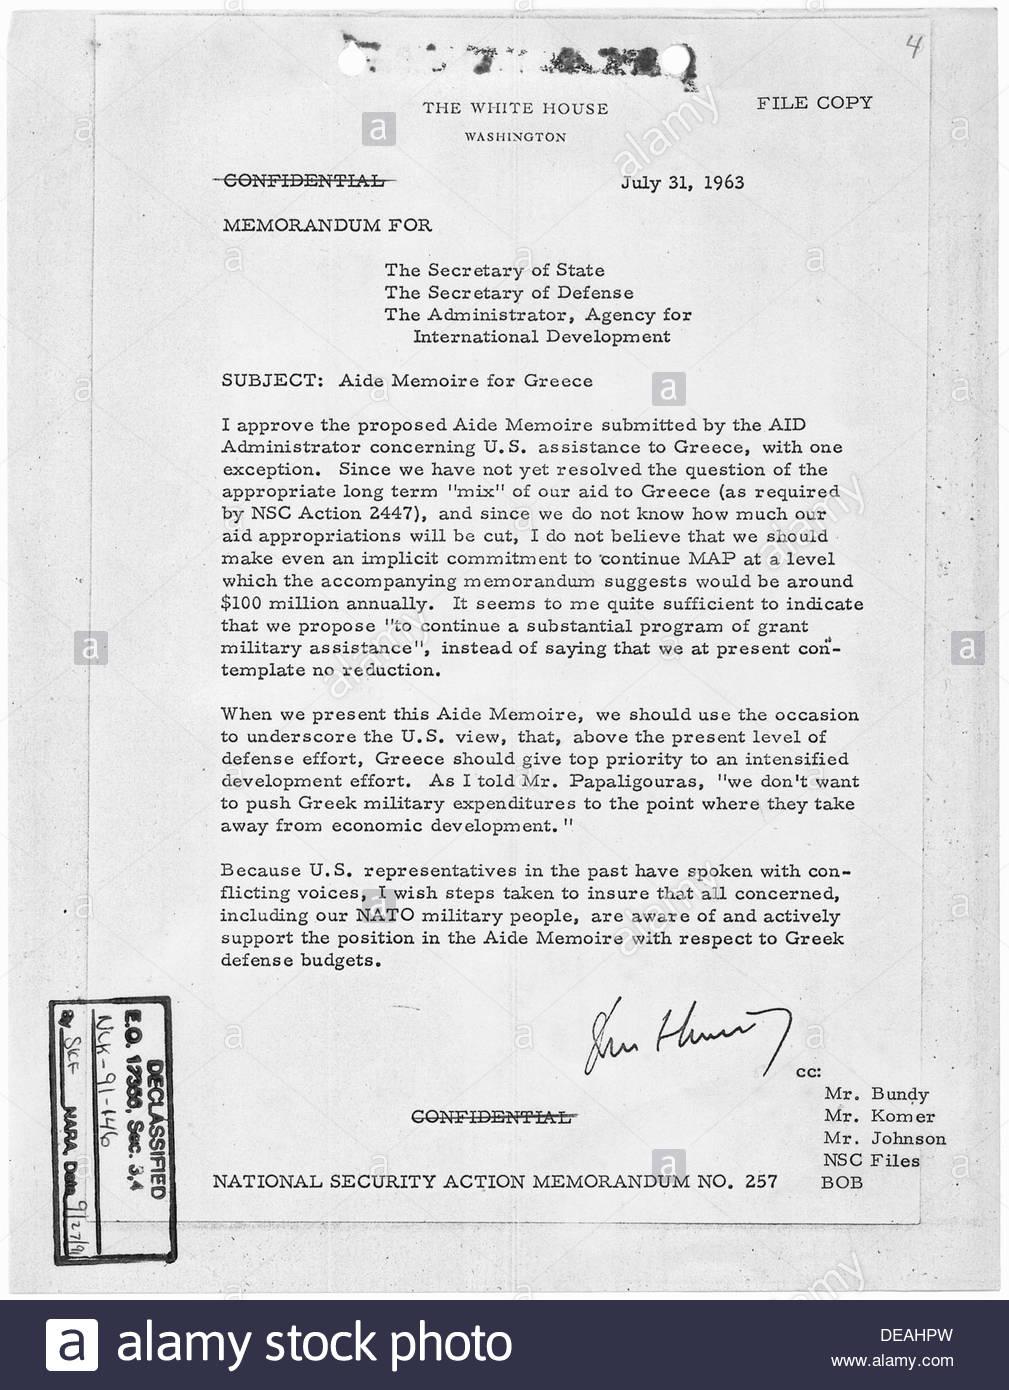 National Security Action Memorandum No. 257 Aide Memoire for Greece 193631  - Stock Image